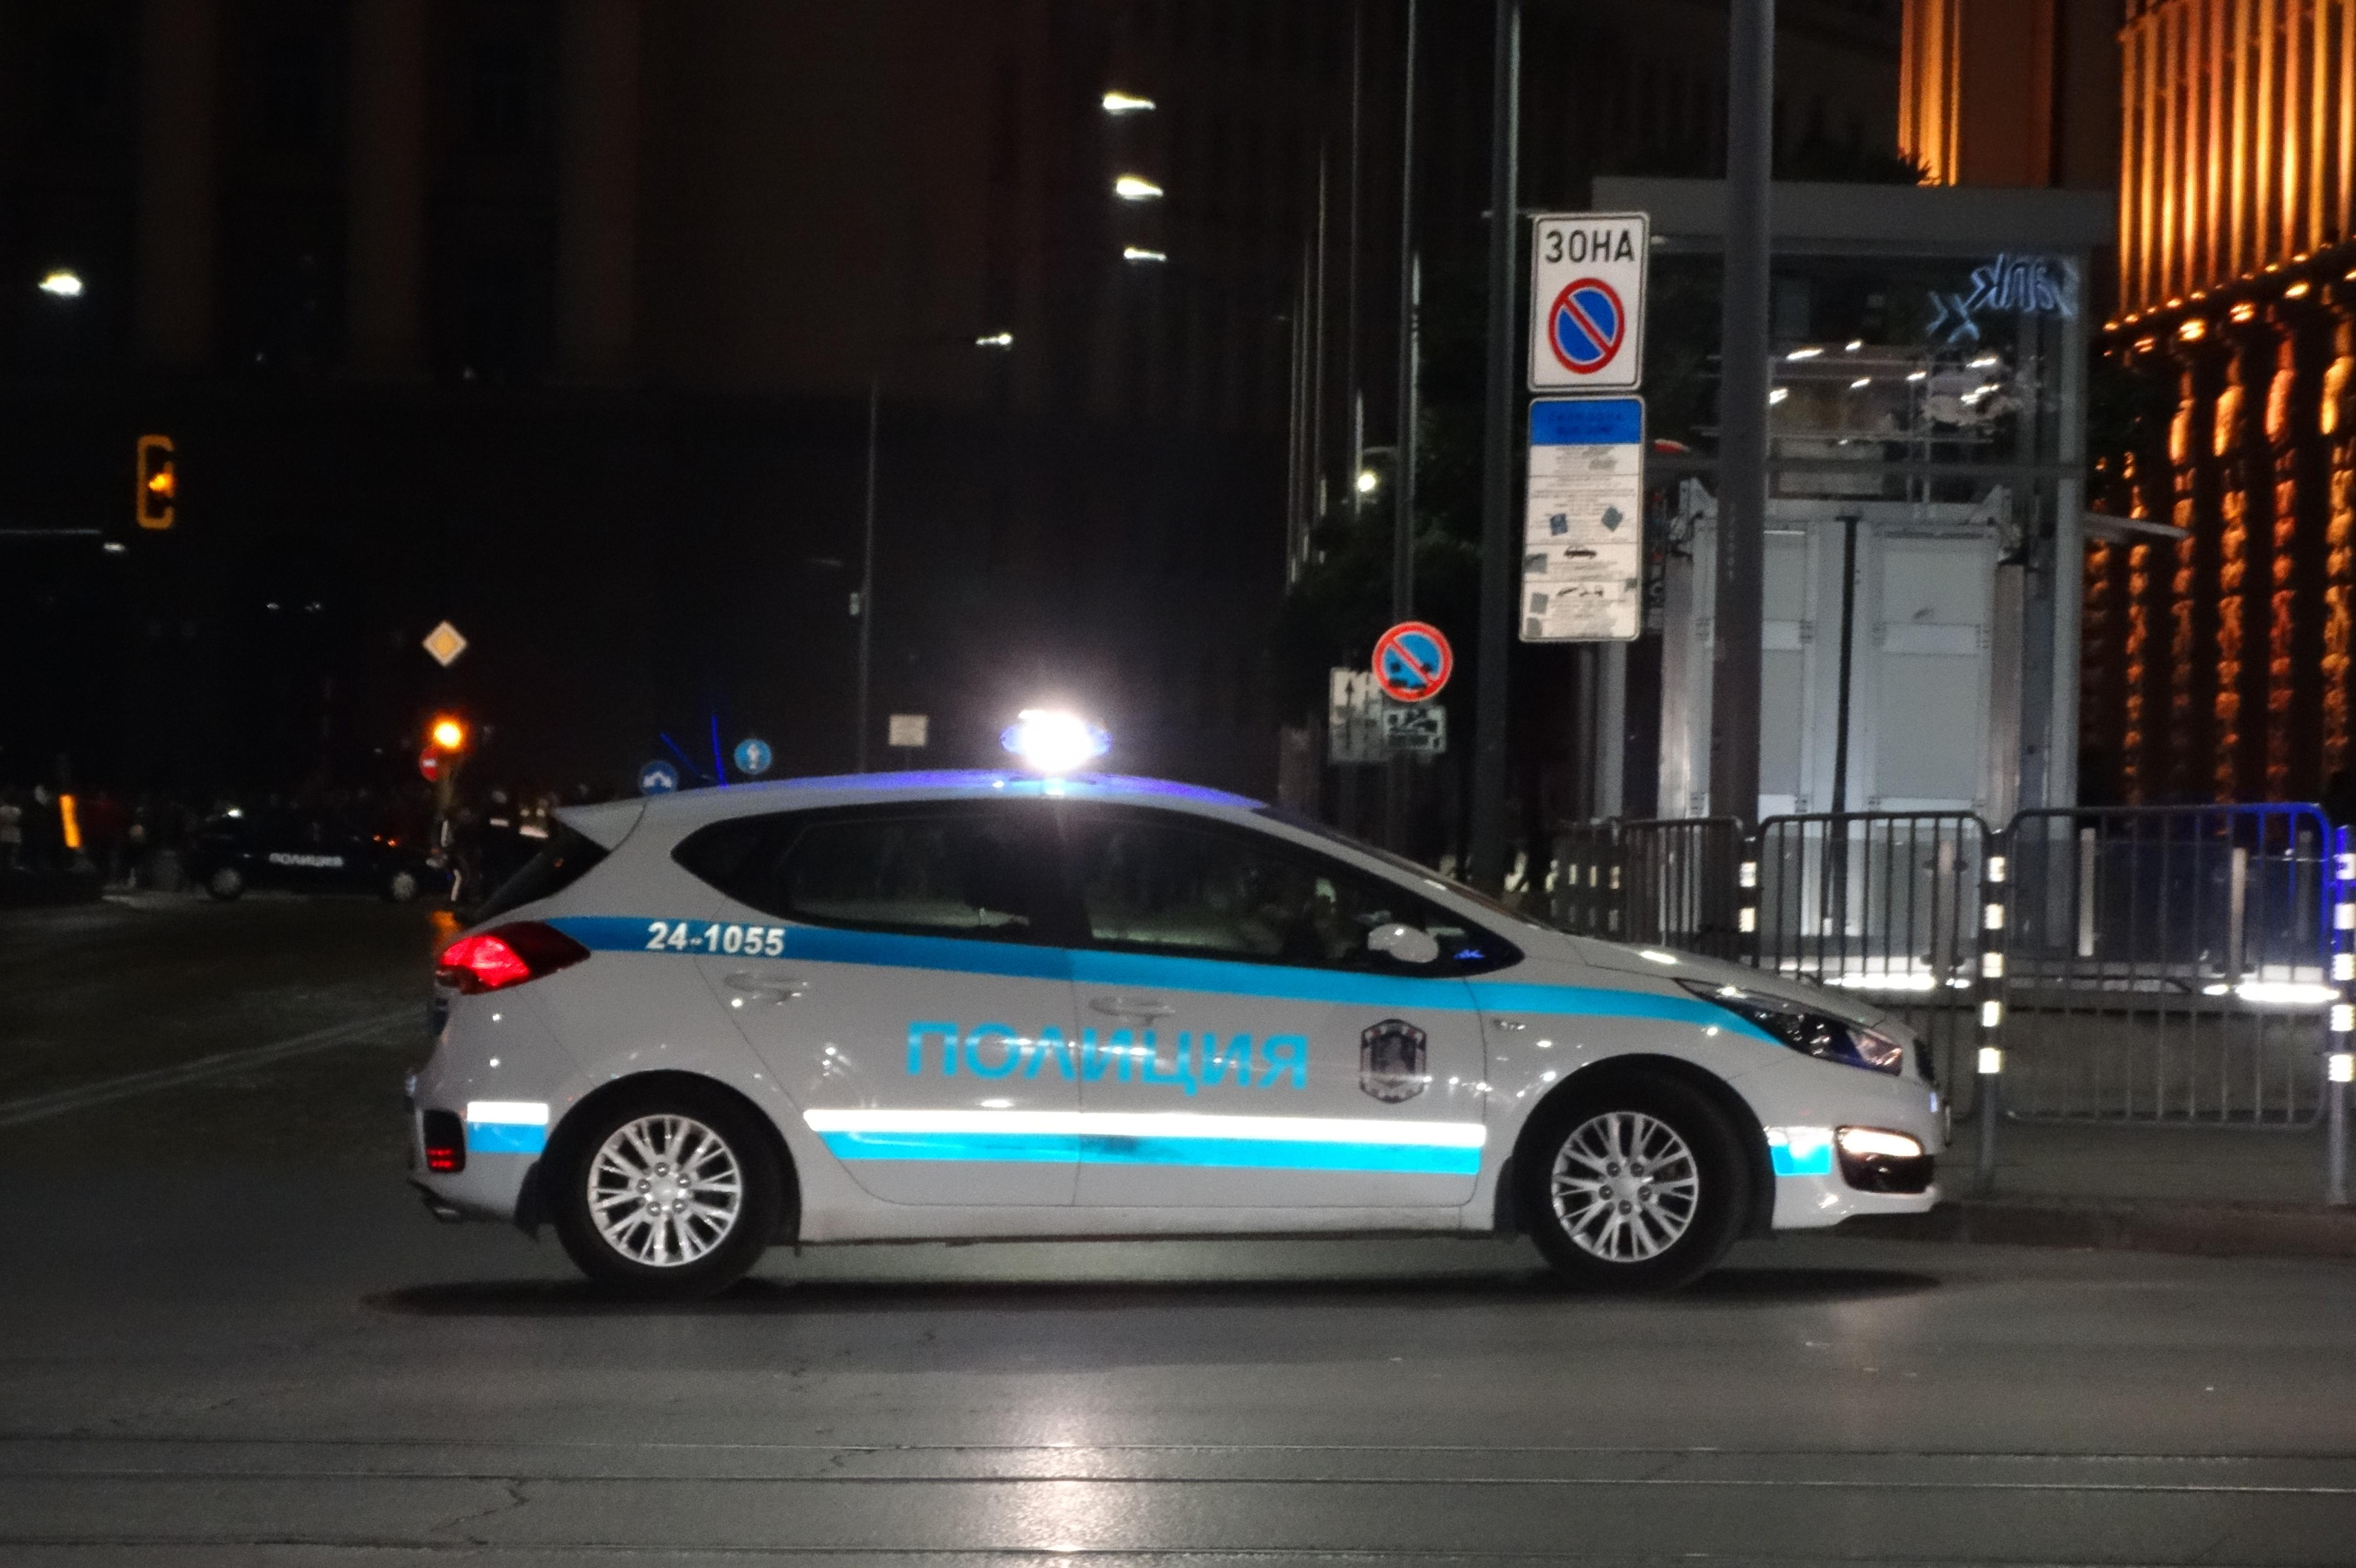 Арестуваха надрусан 22-годишен шофьор от с. Душанци